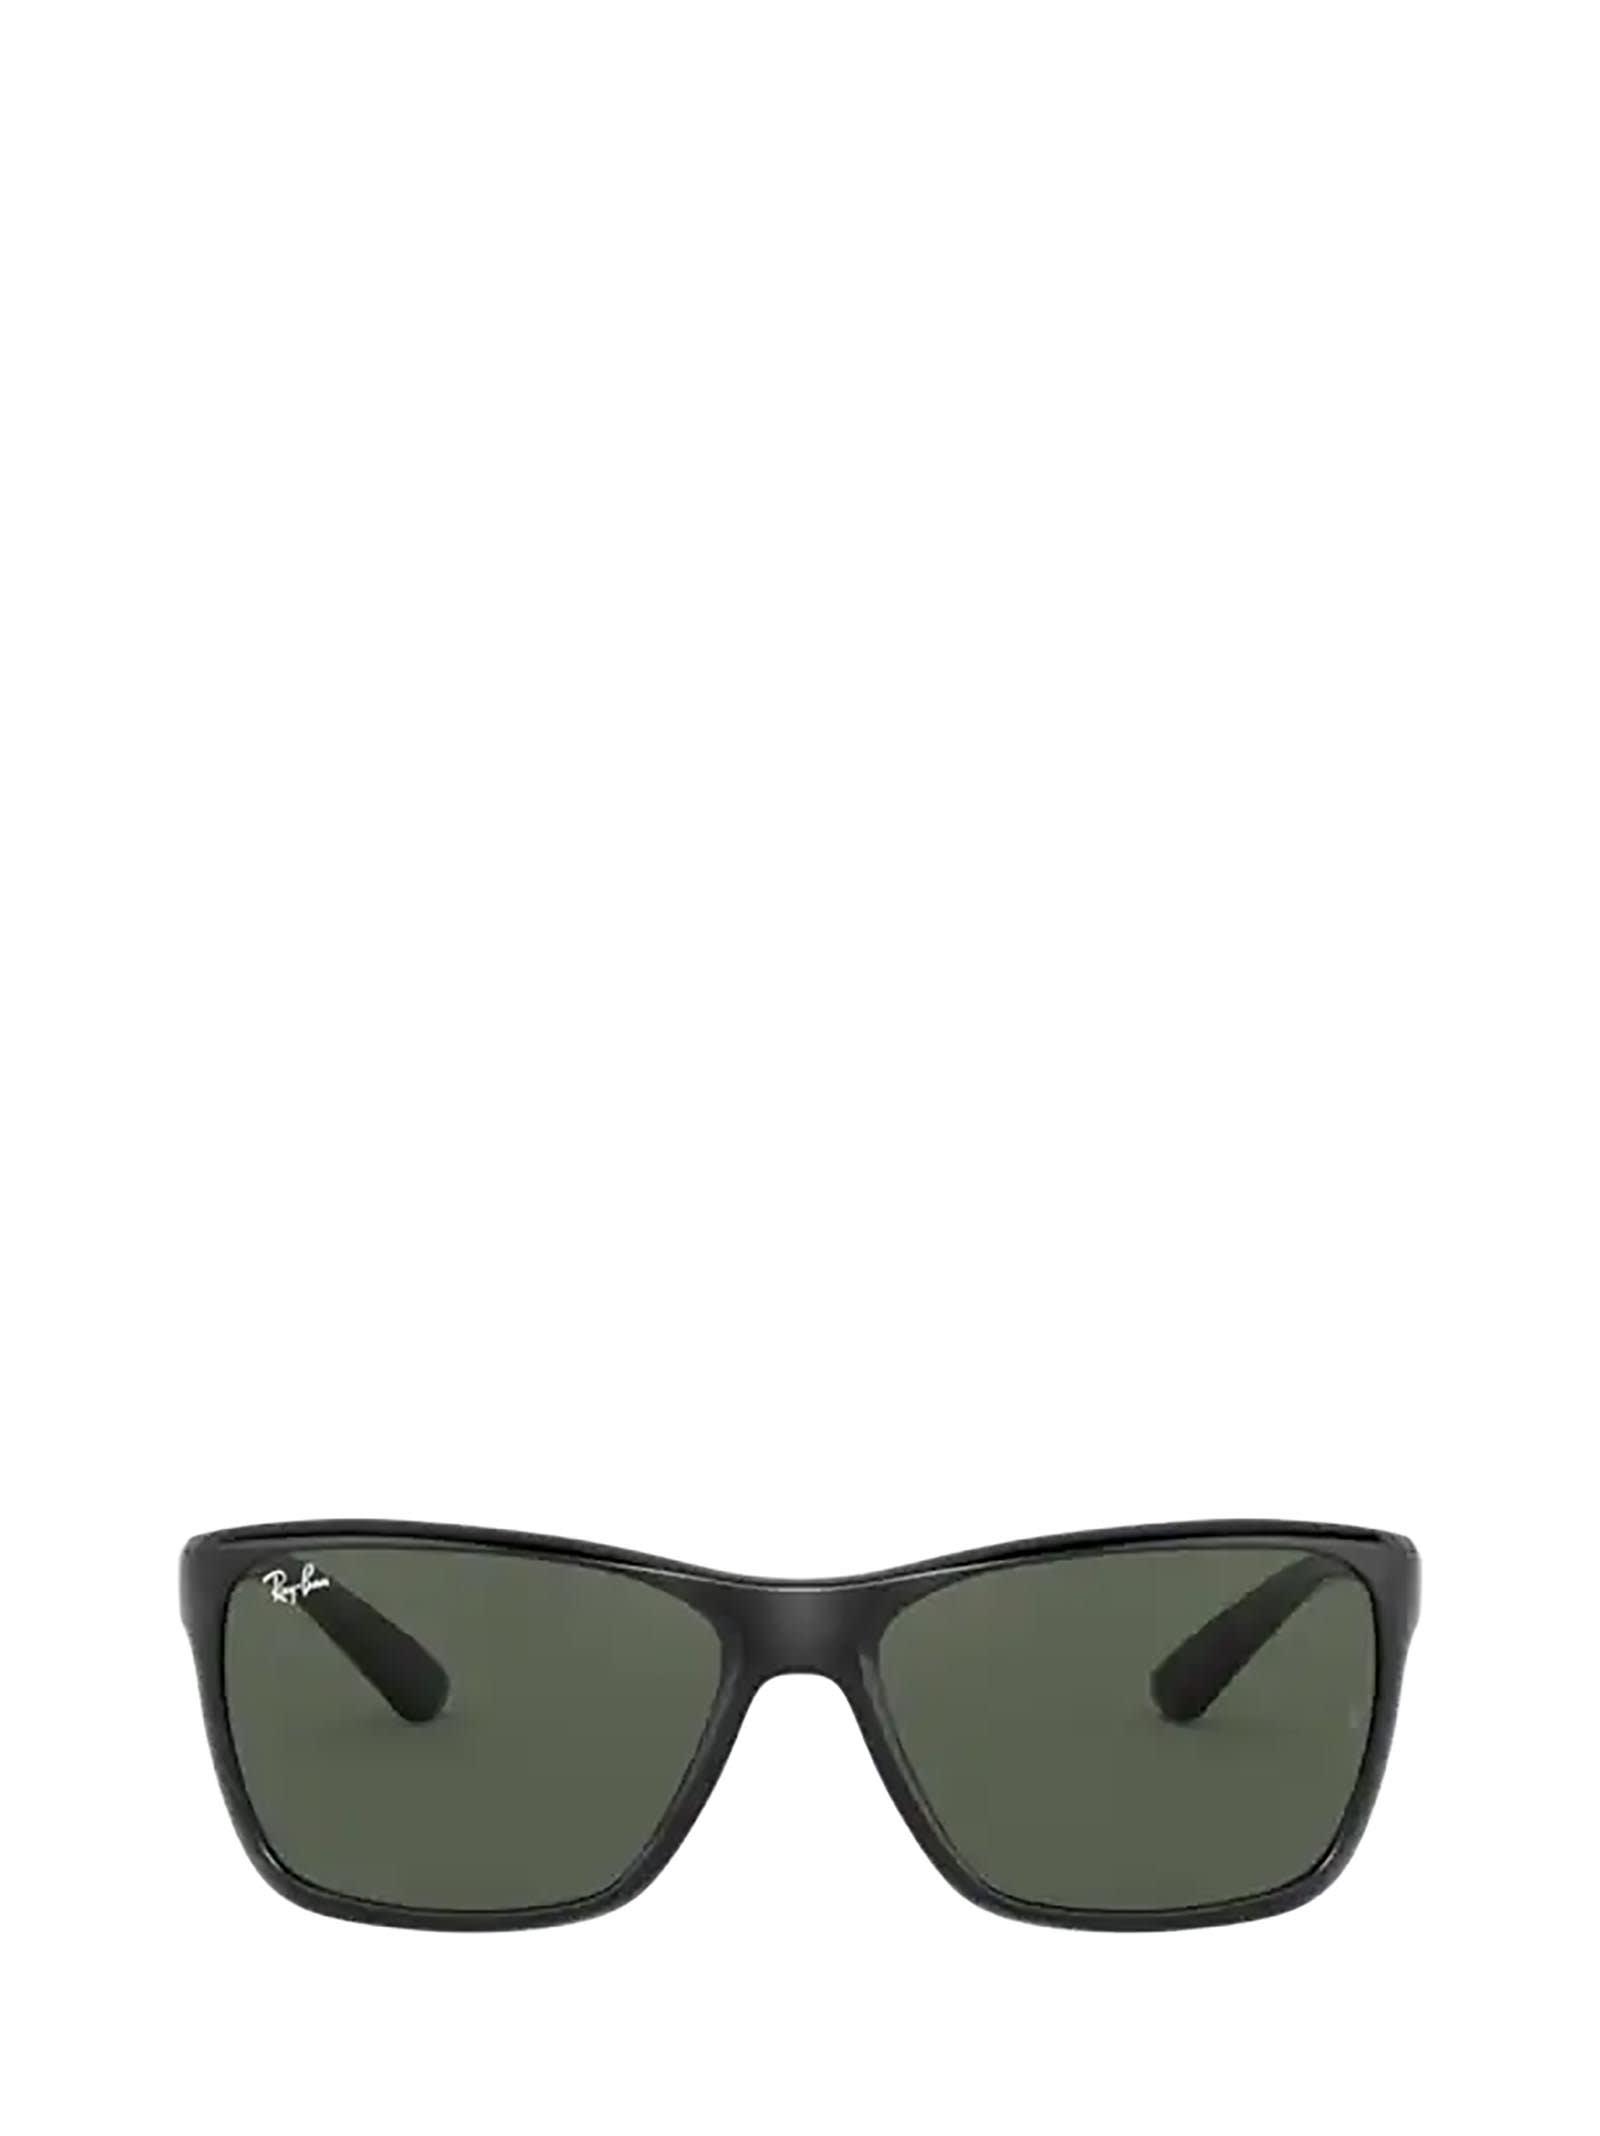 Ray-Ban Ray-ban Rb4331 Black Sunglasses